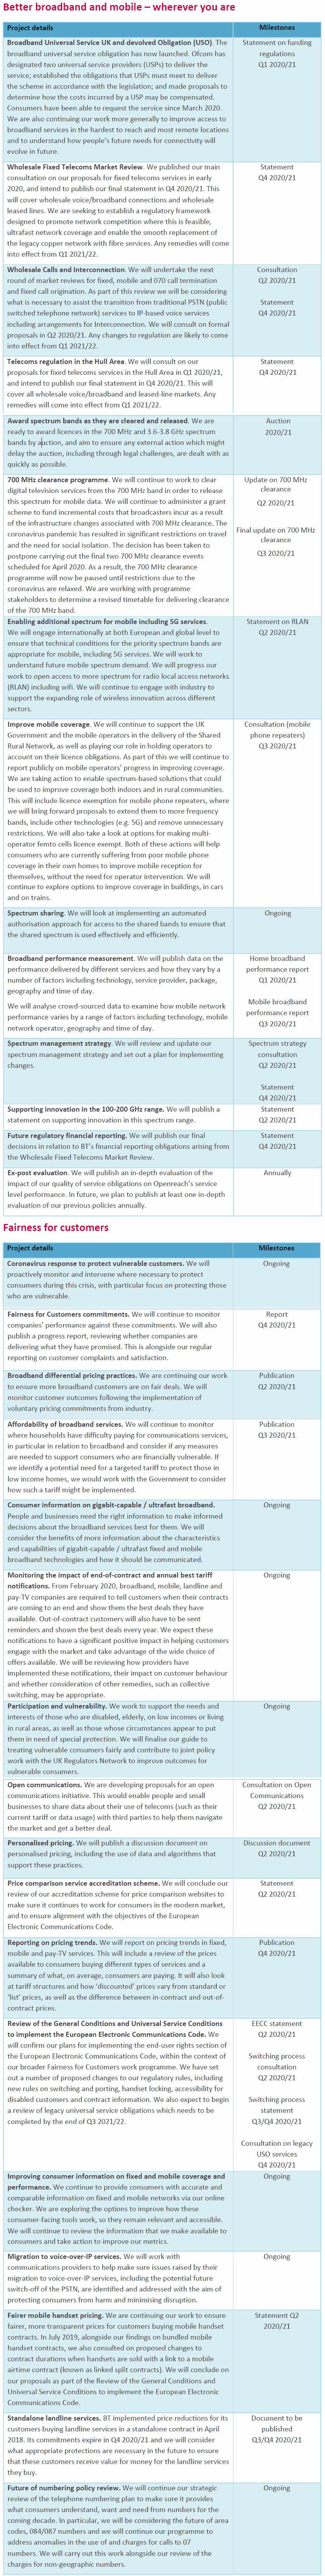 ofcom revised annual plan 2020-21